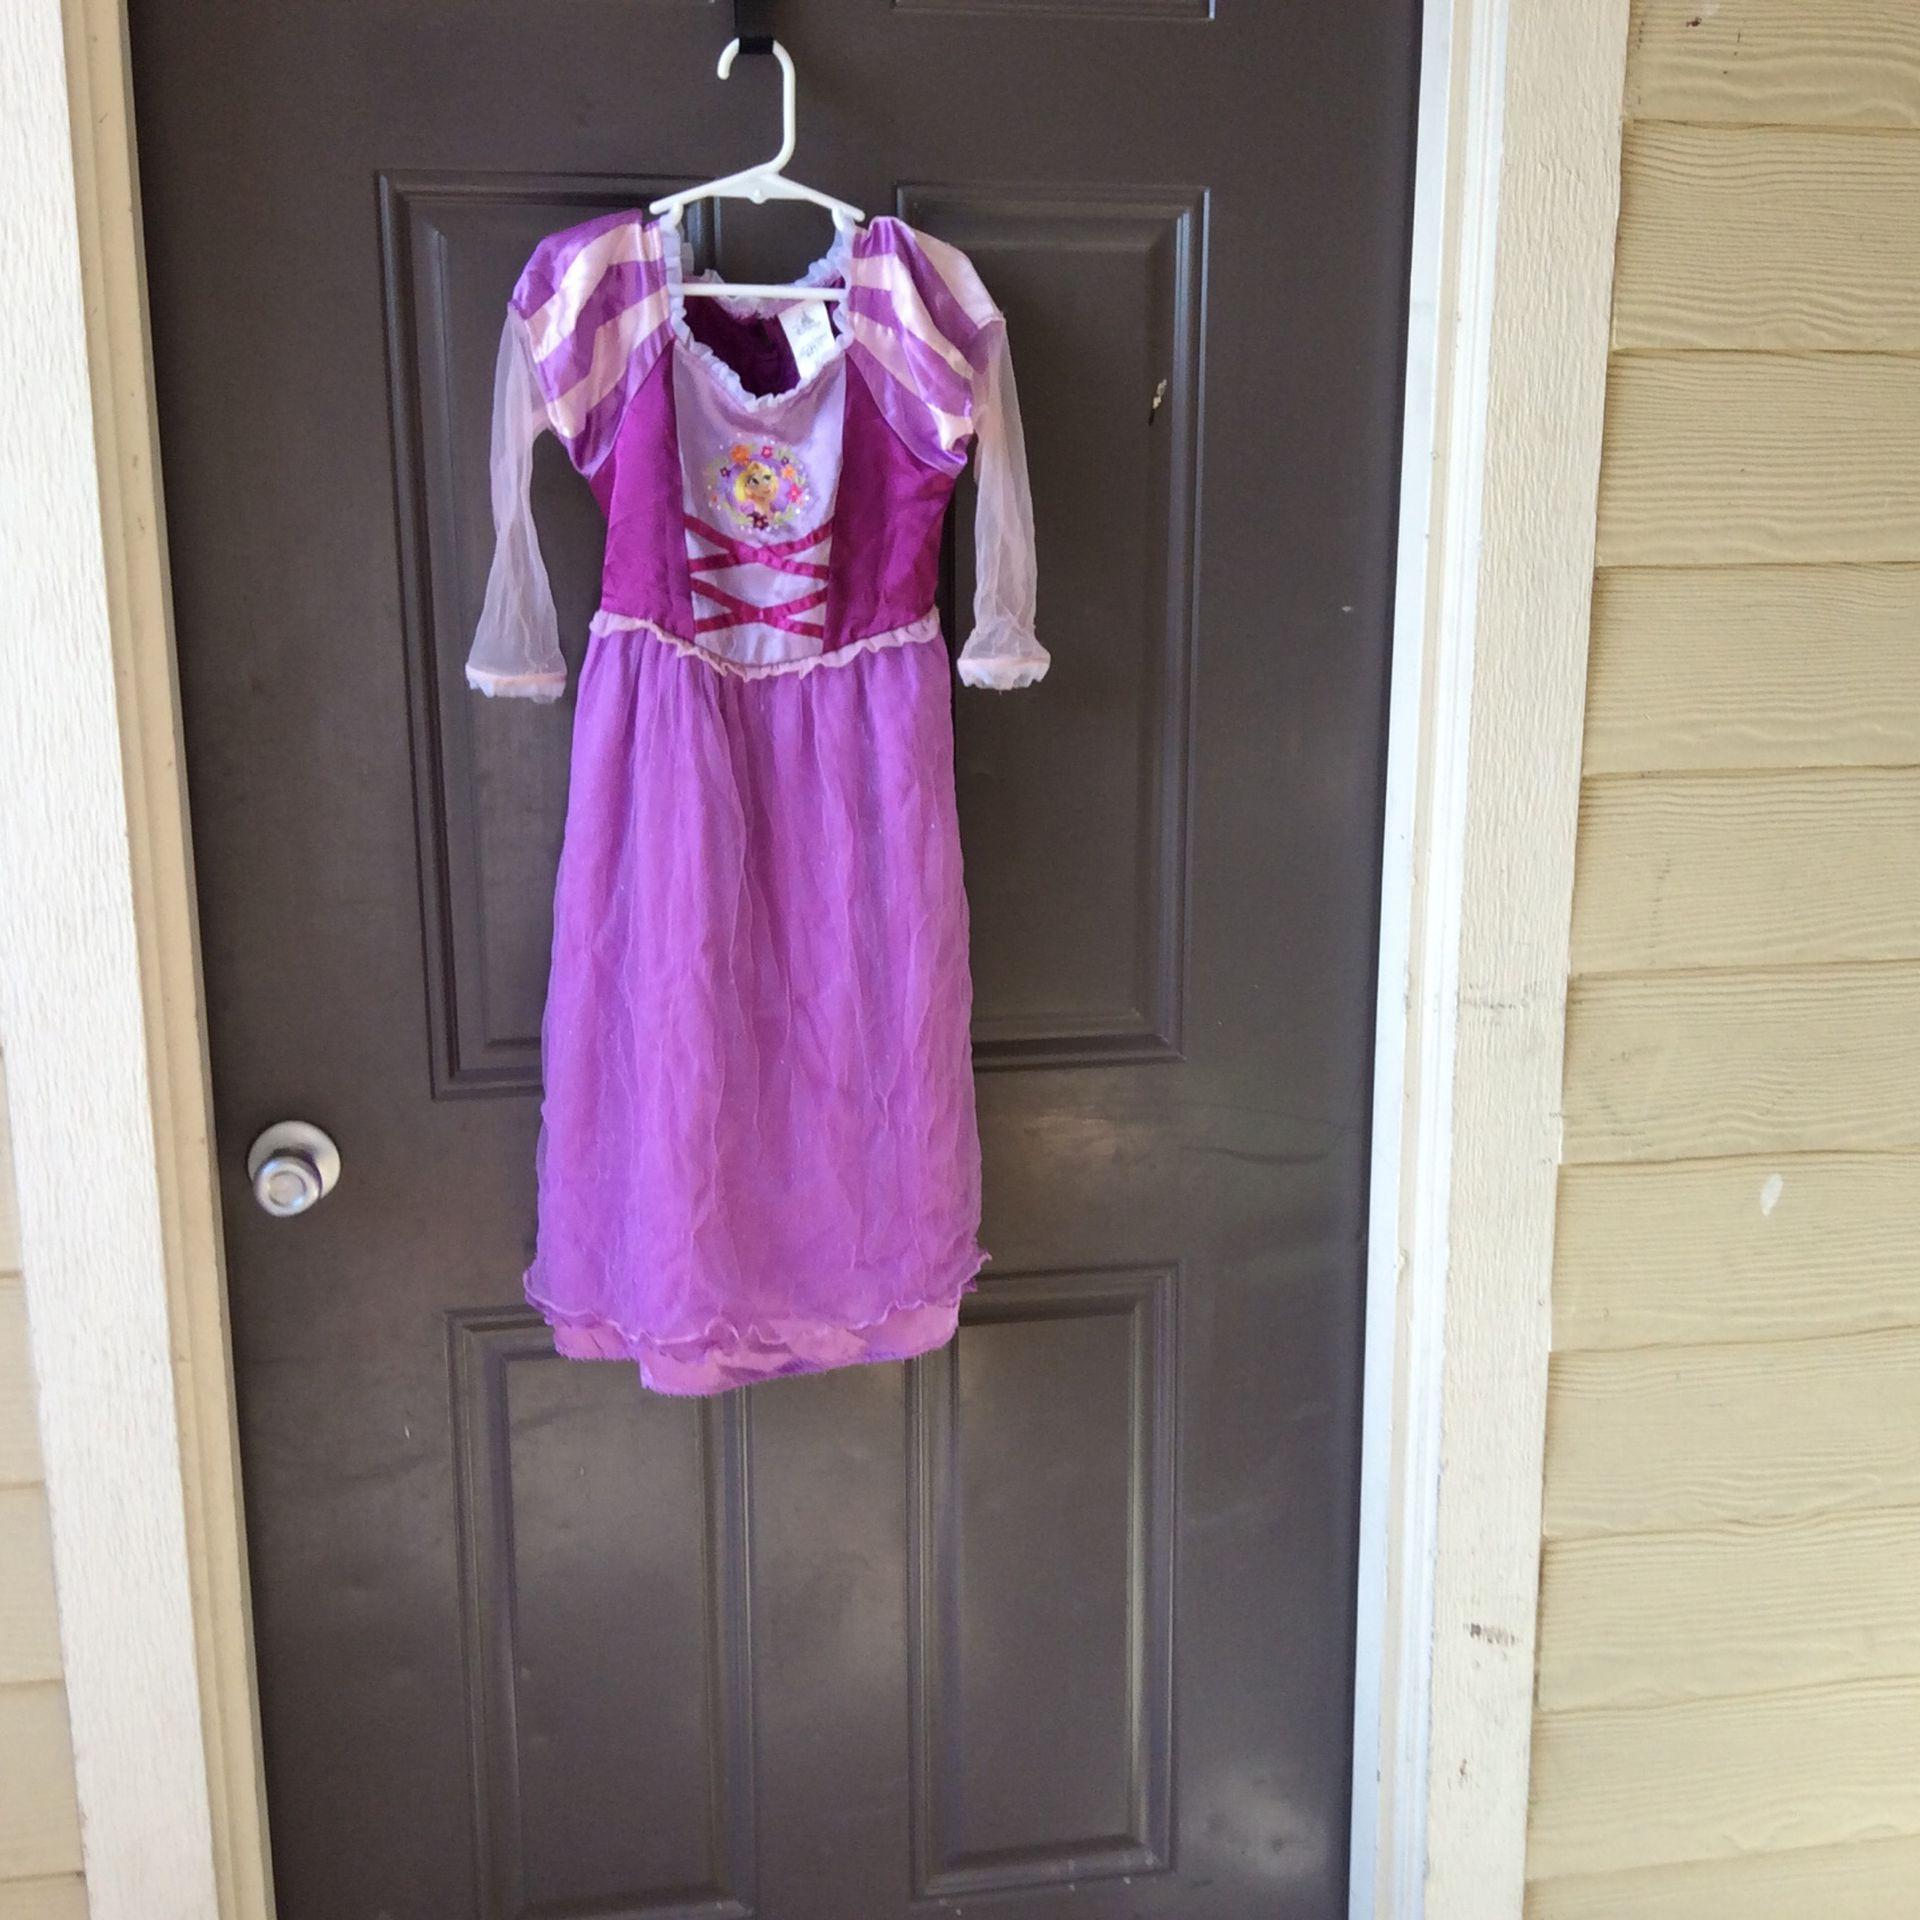 Rapunzel Costume, Size 4, Used